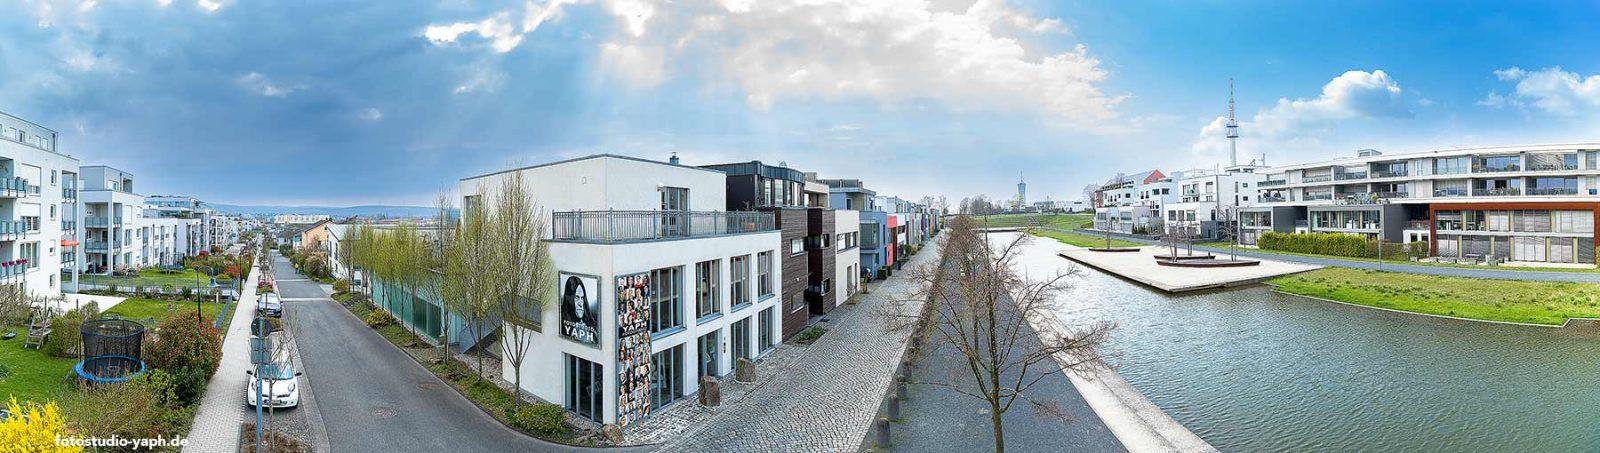 Das Fotostudio in Trier Yaph auf dem Petrisberg am Wasserband